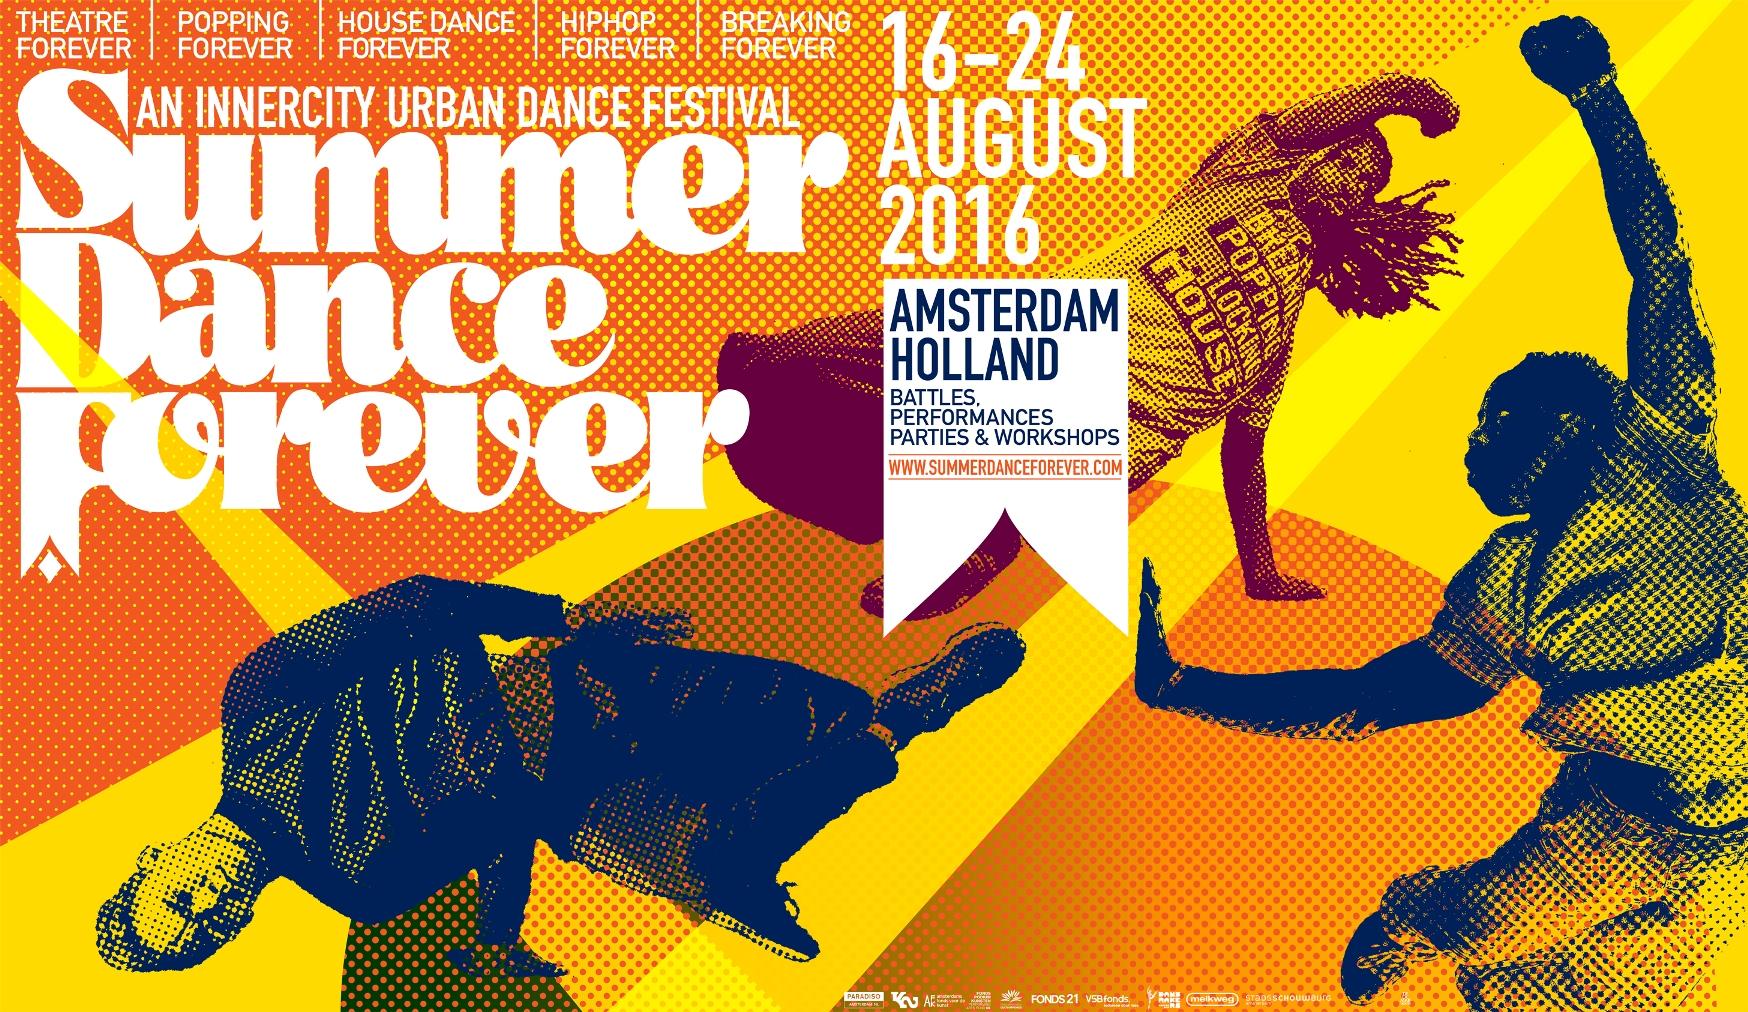 Programme & tickets Summer Dance Forever 2016